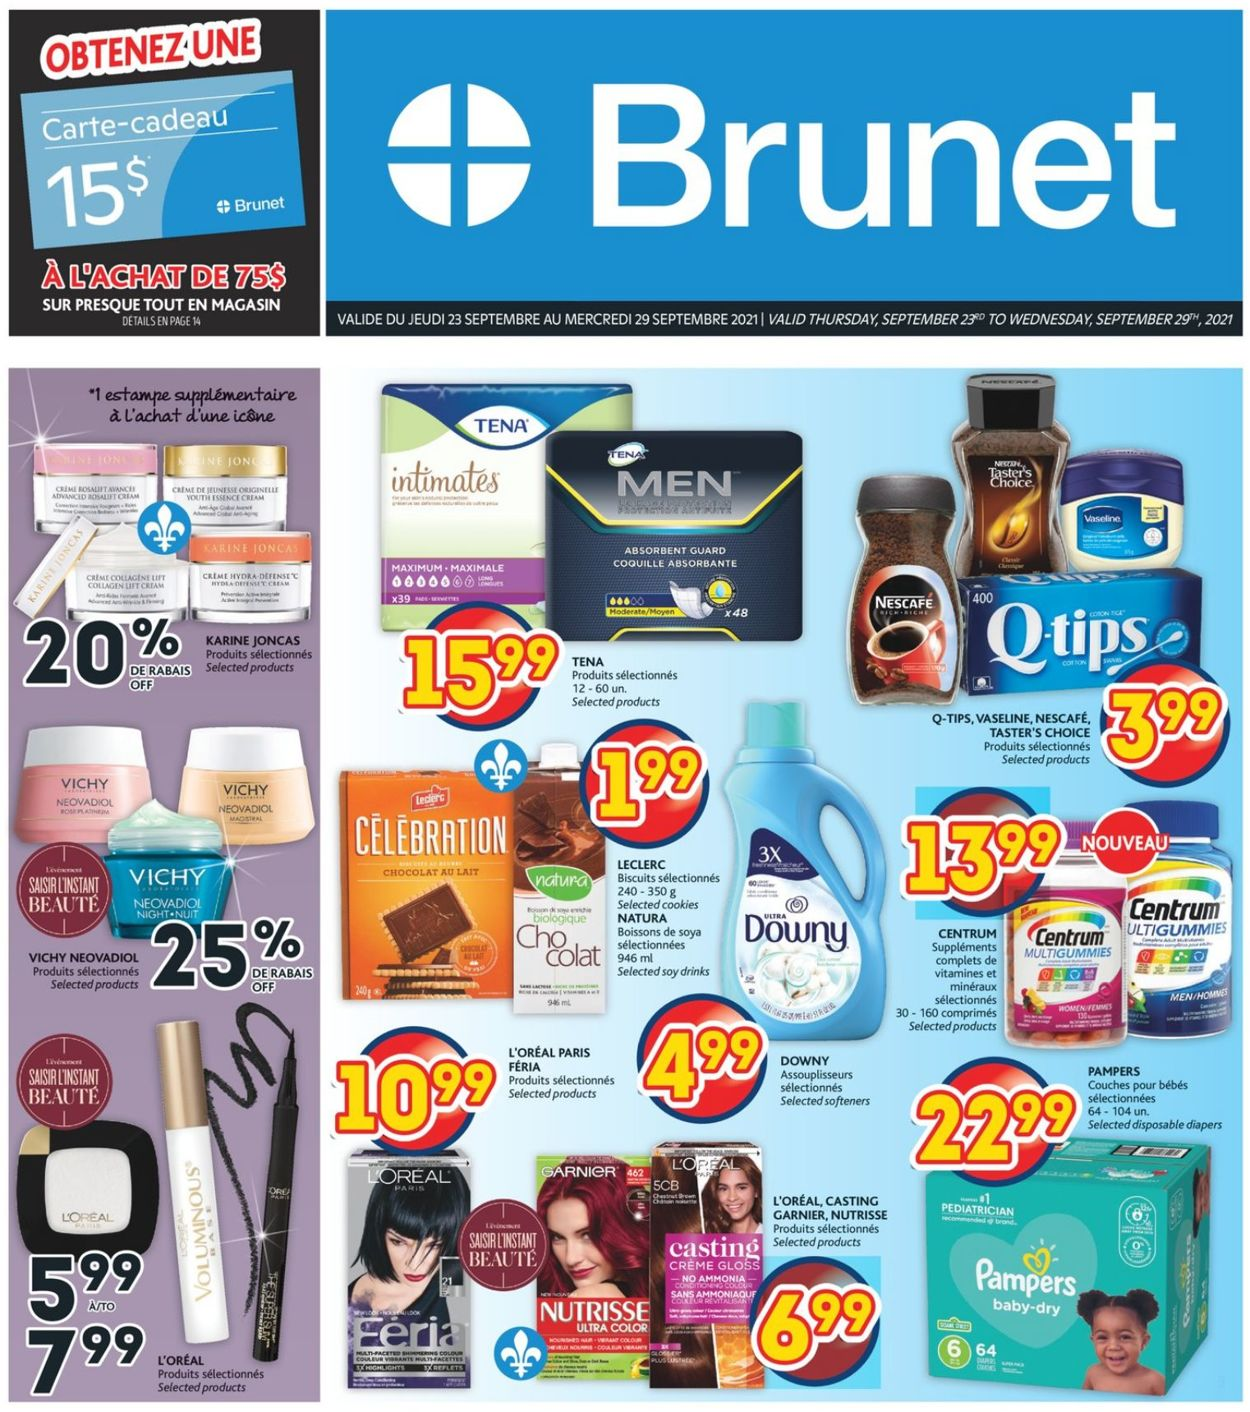 Brunet Flyer - 09/23-09/29/2021